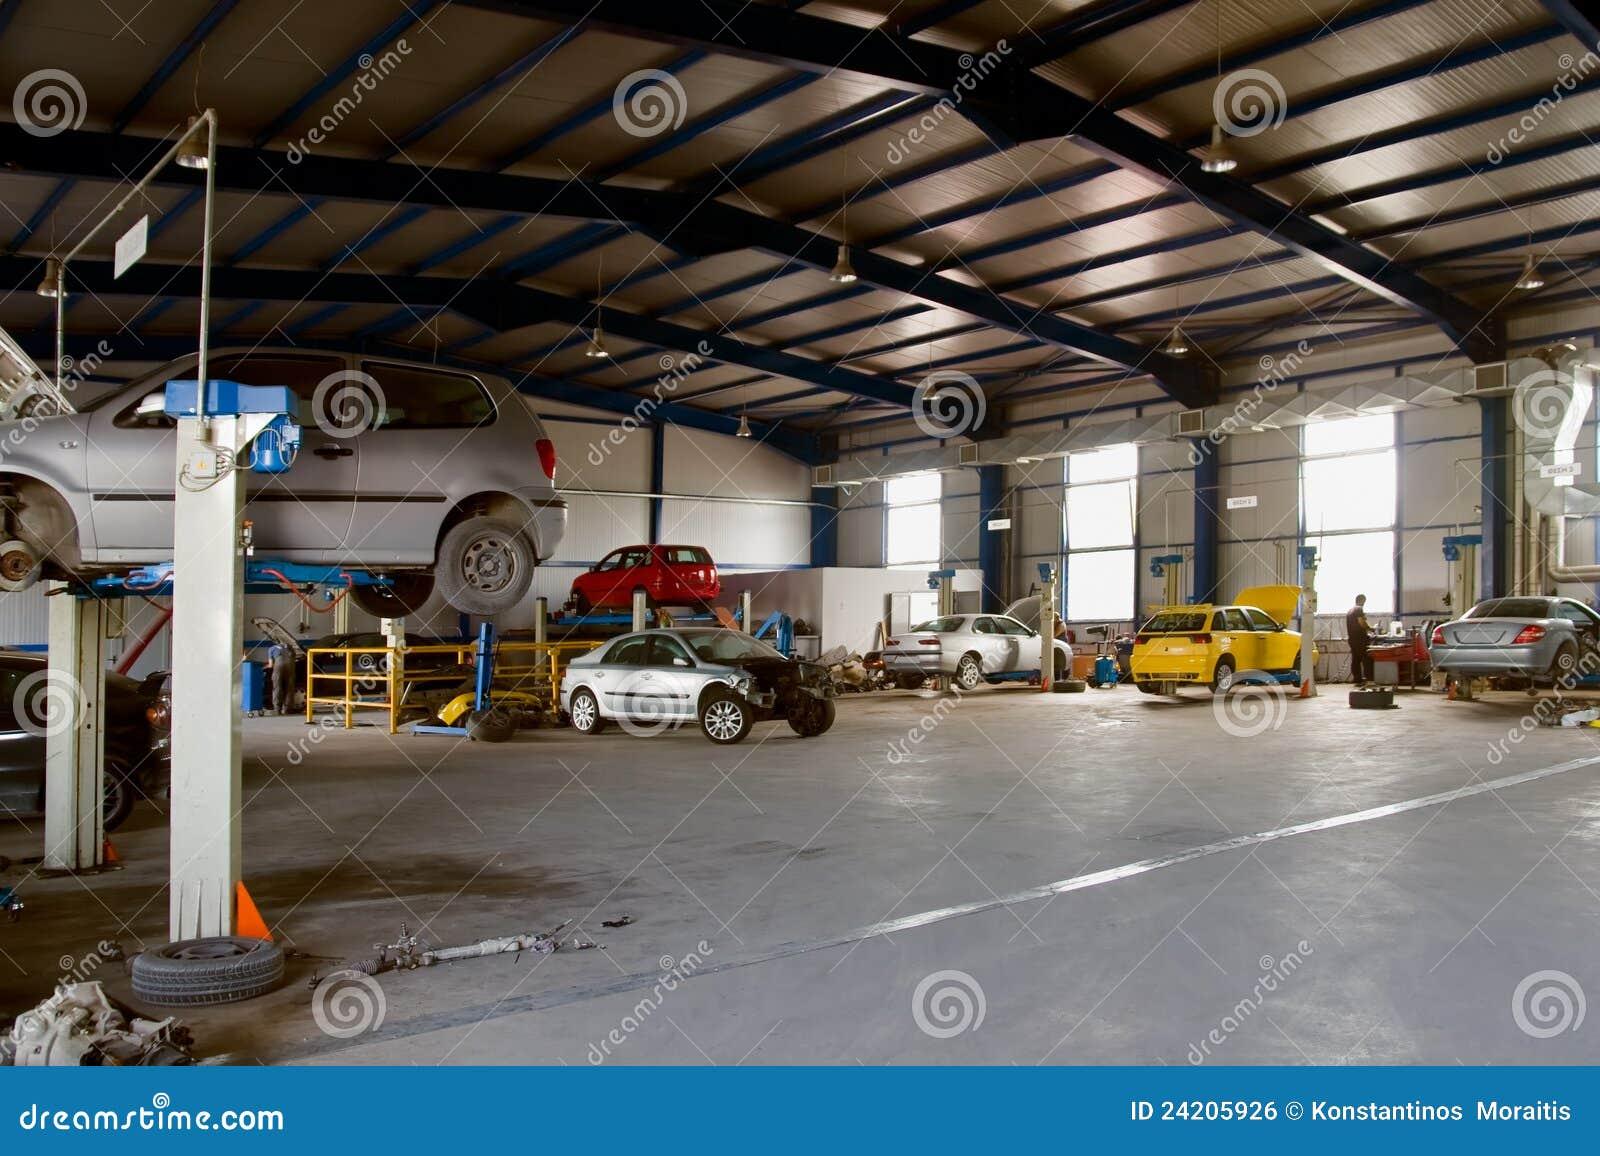 Auto garage clipart for Garage villeneuve auto service